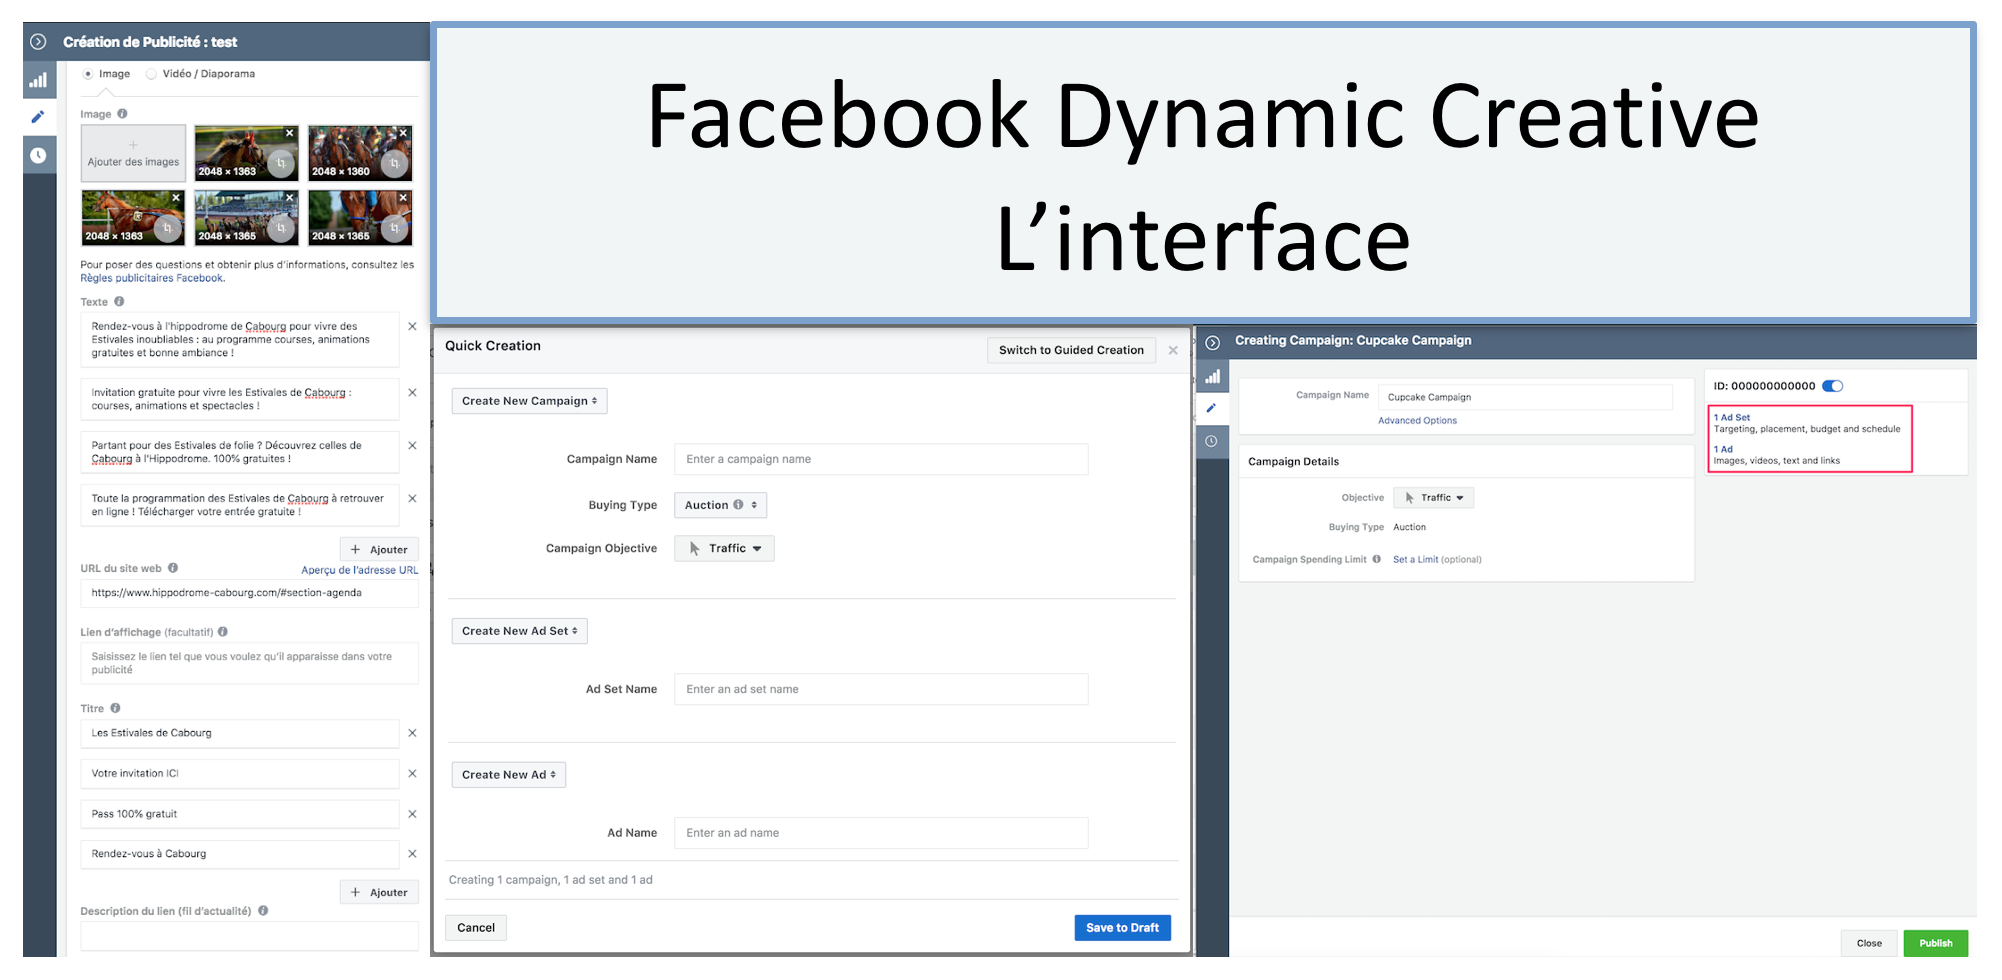 facebook dynamic creative interface alt